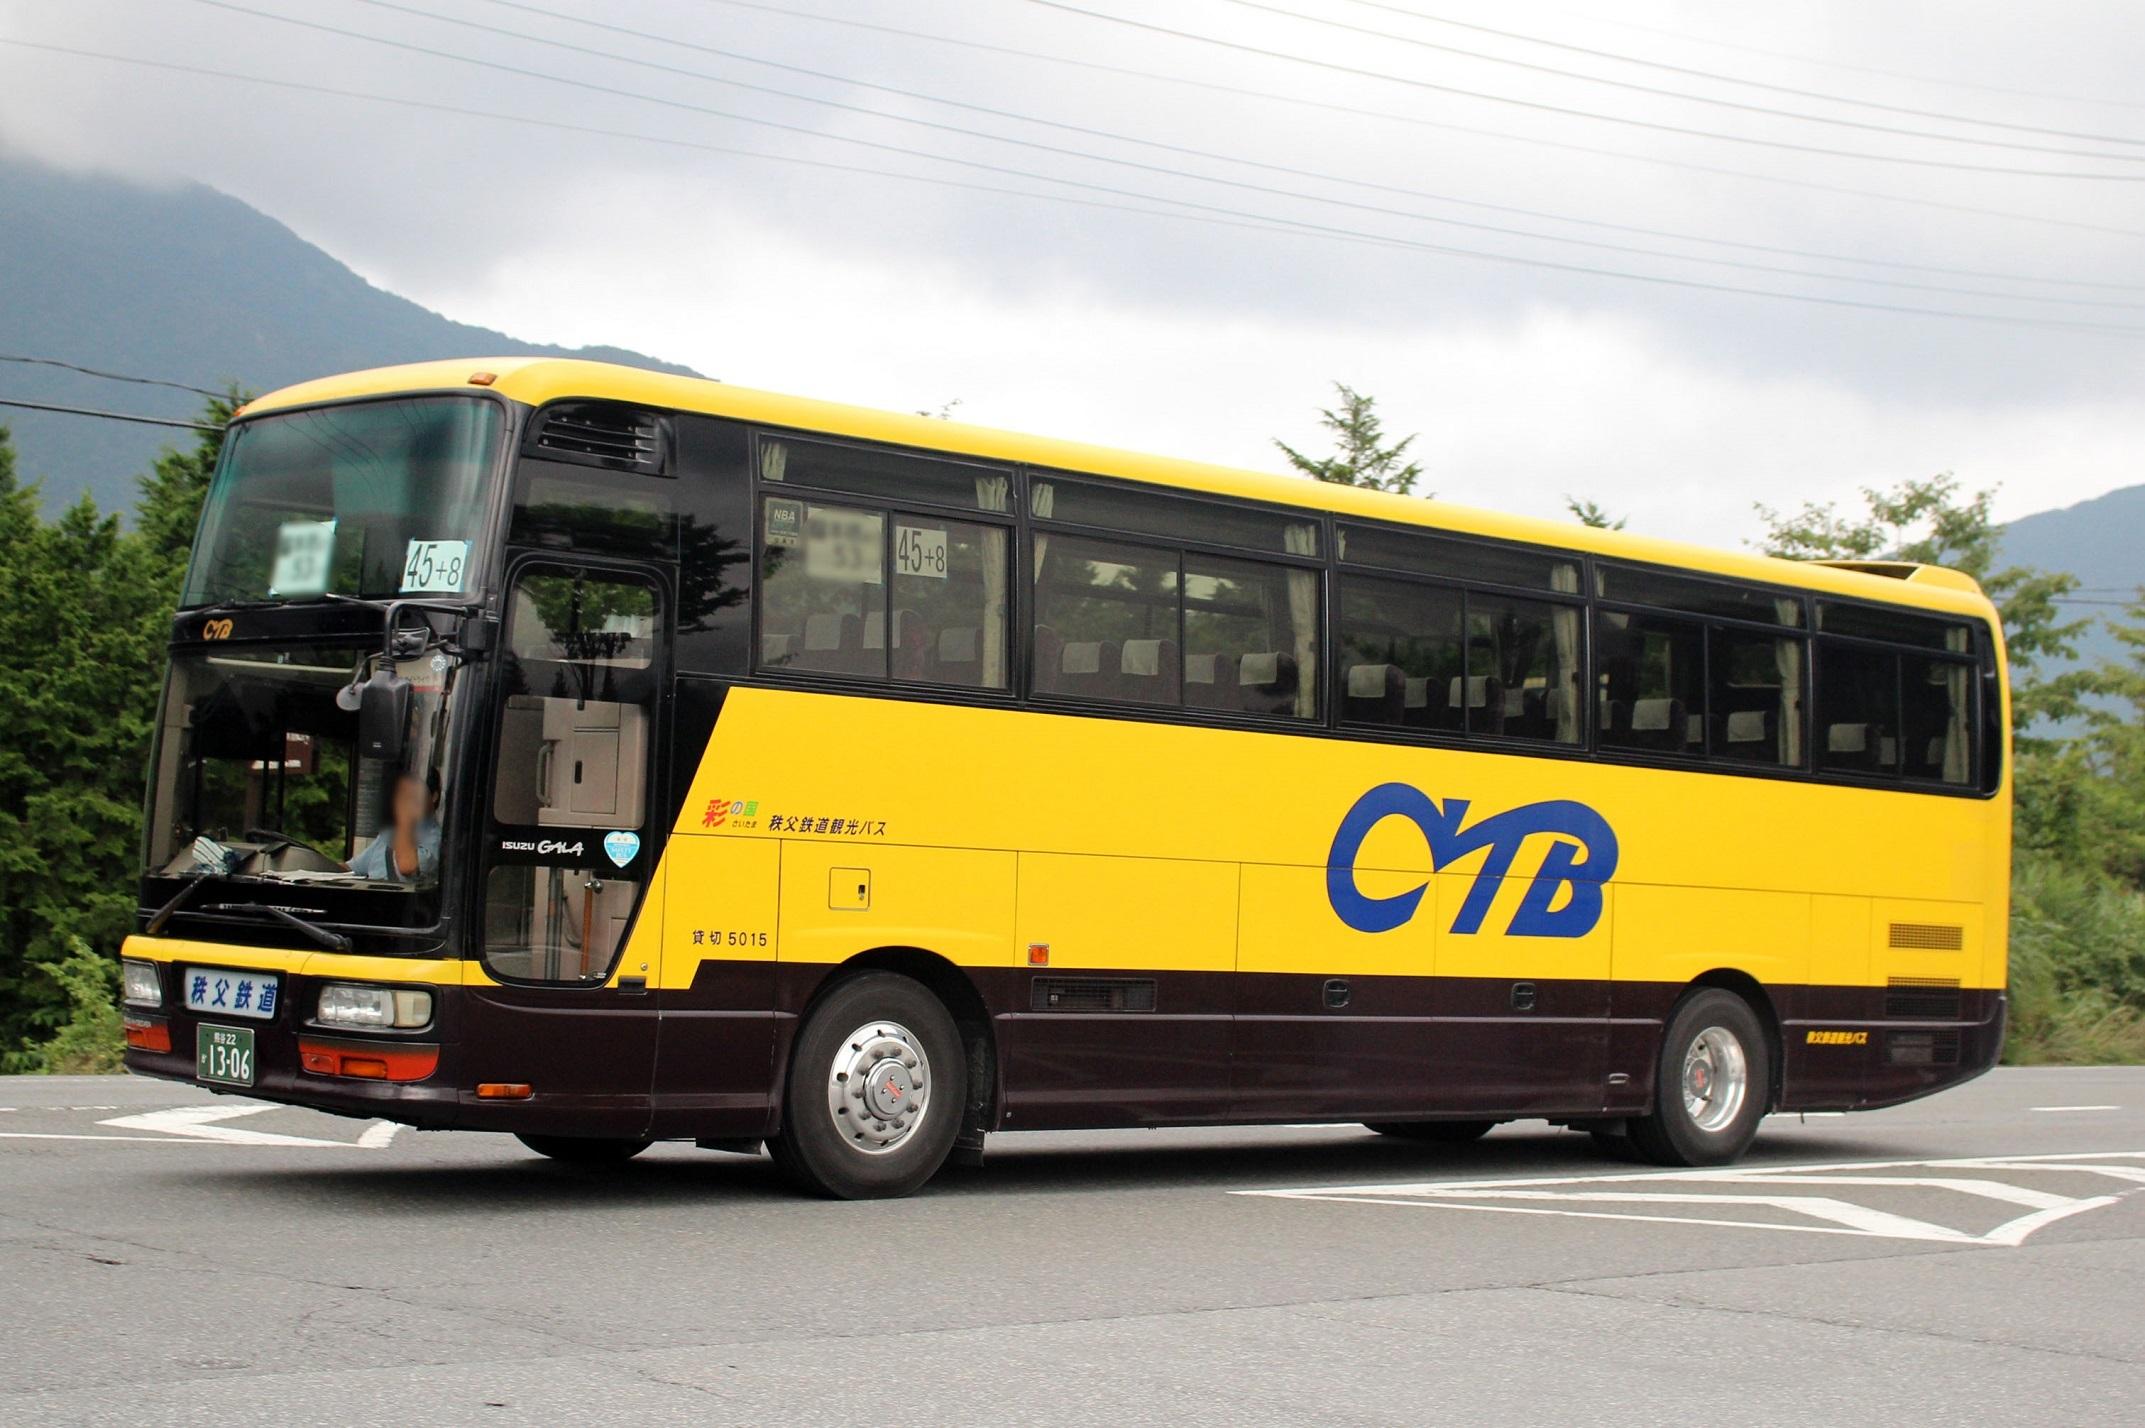 秩父鉄道観光バス 5015